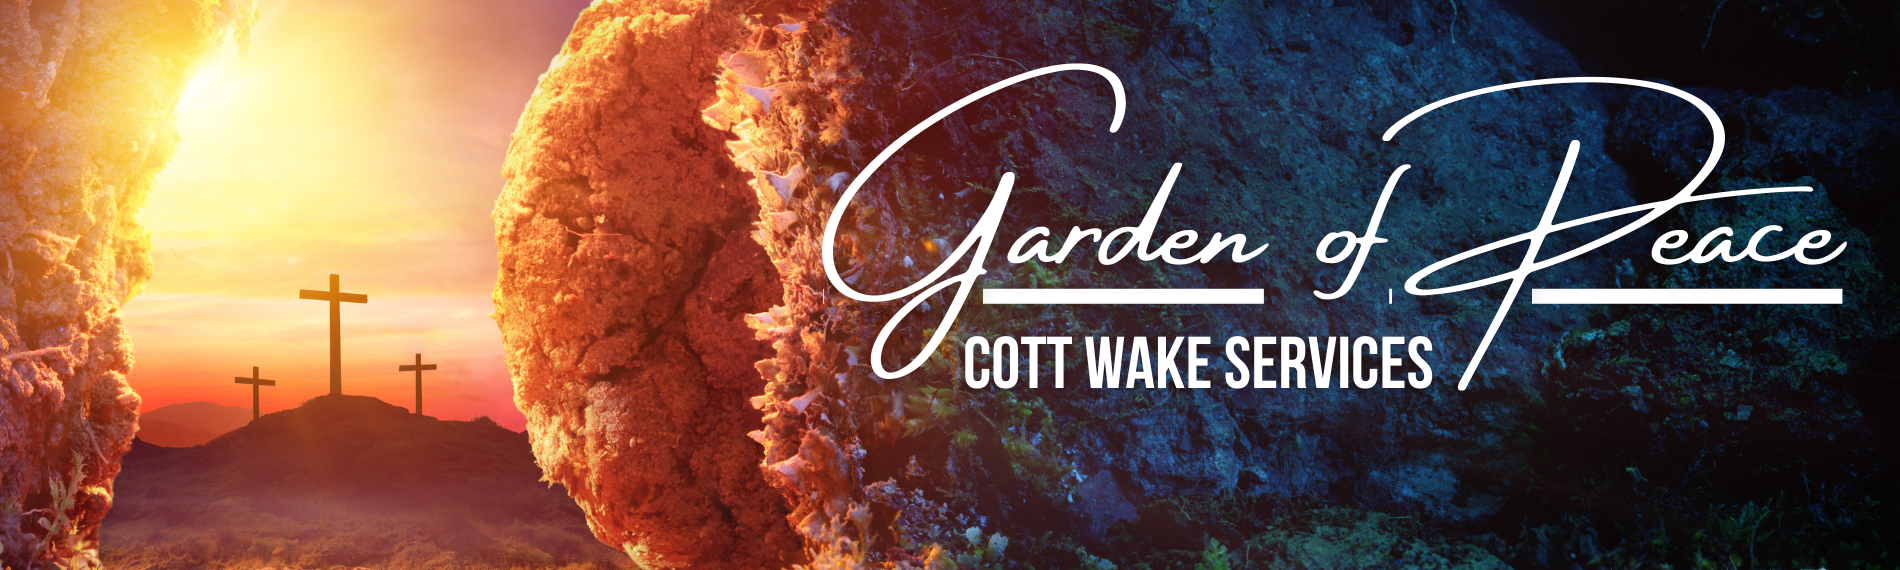 Cott Wake Svc (info page)